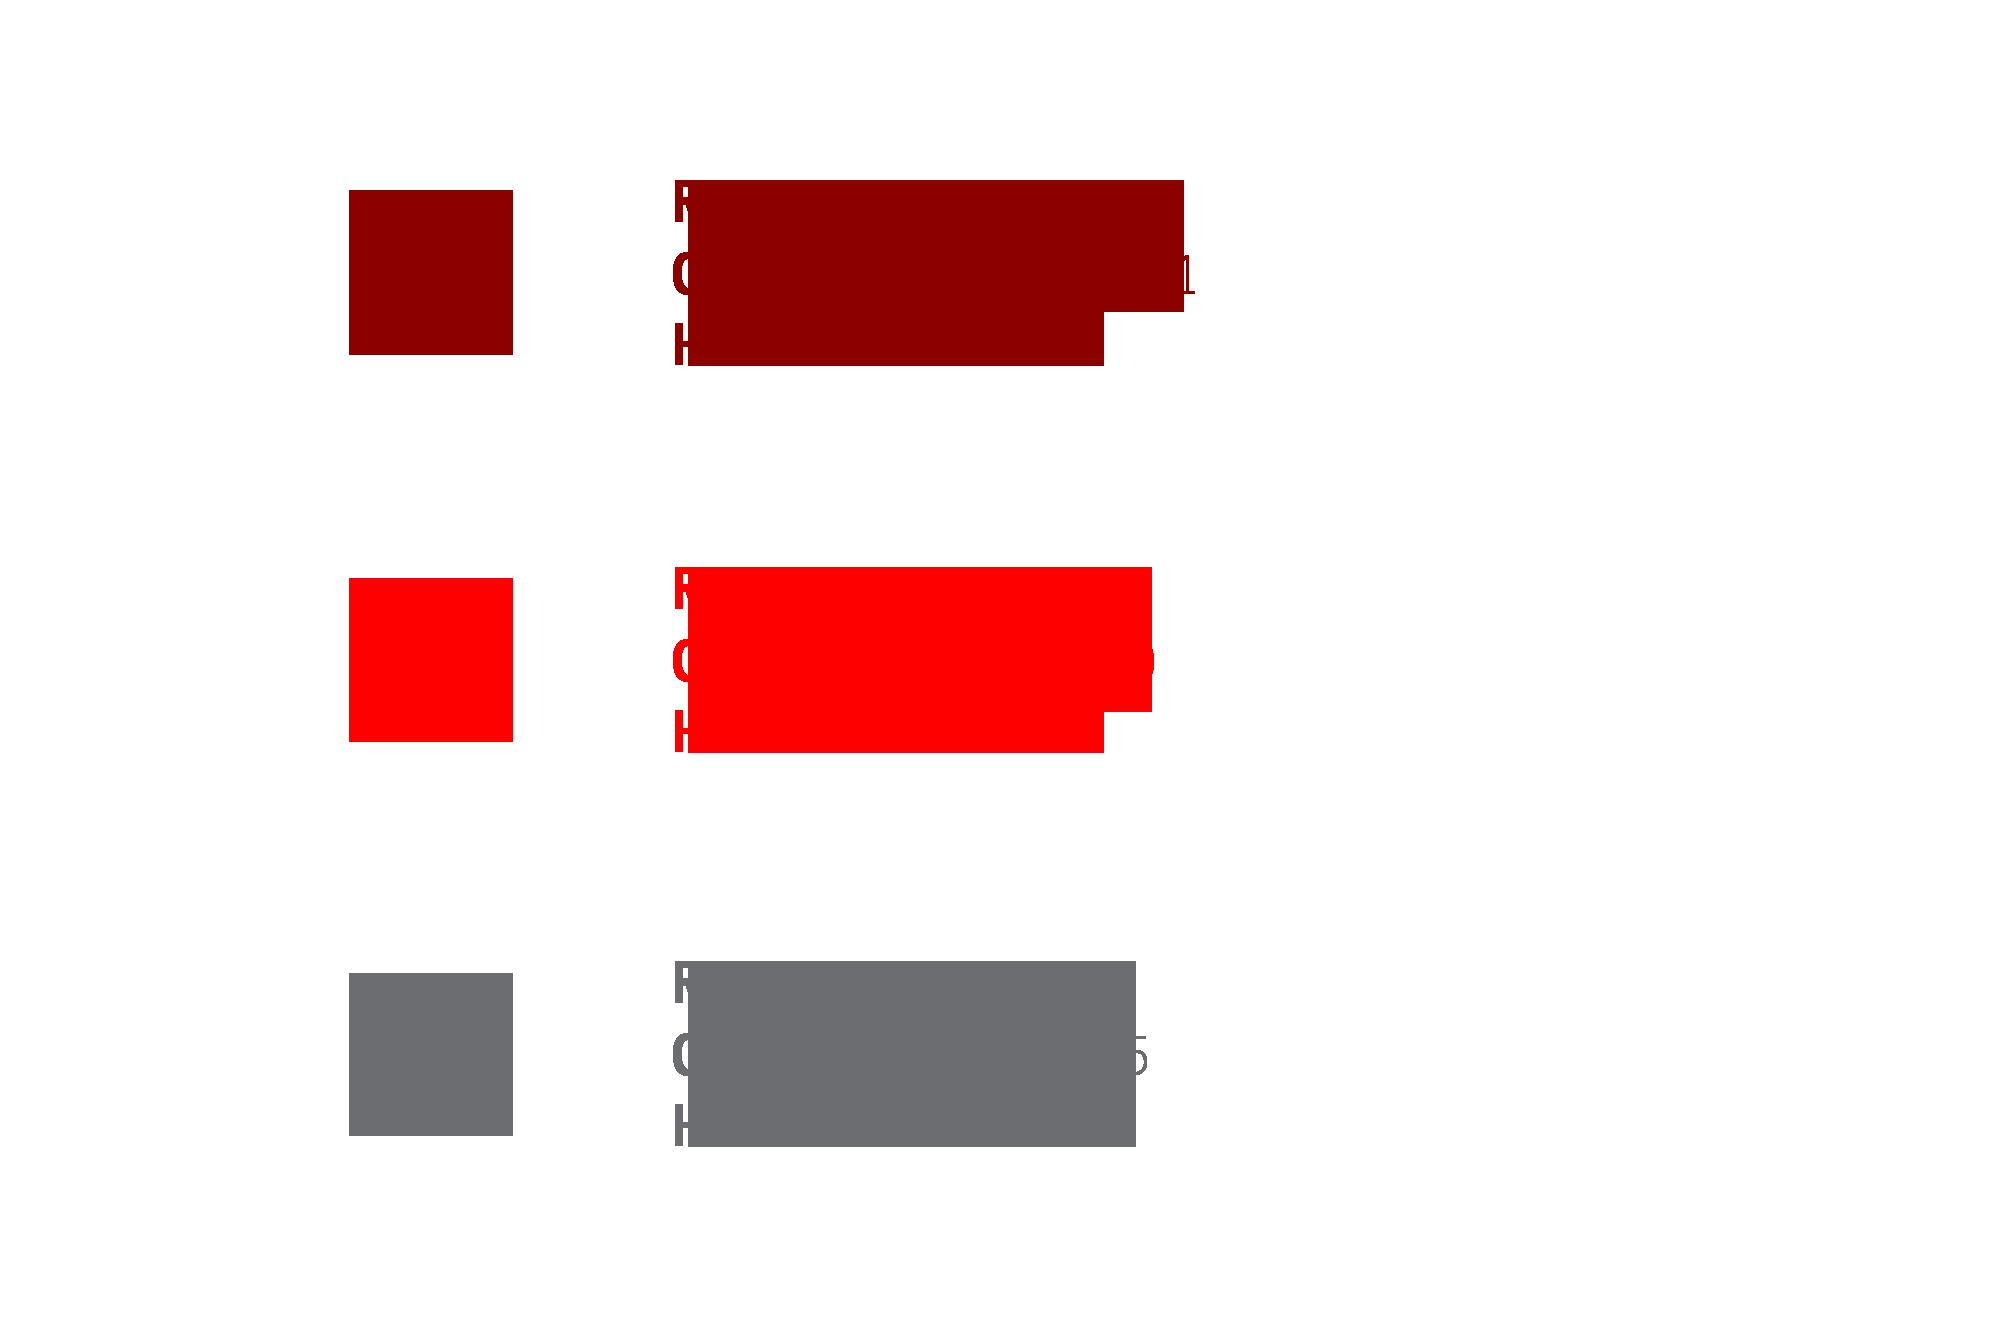 raniev-rod-alvarez-diseño-gráfico-queretaro-iqbit-11-color